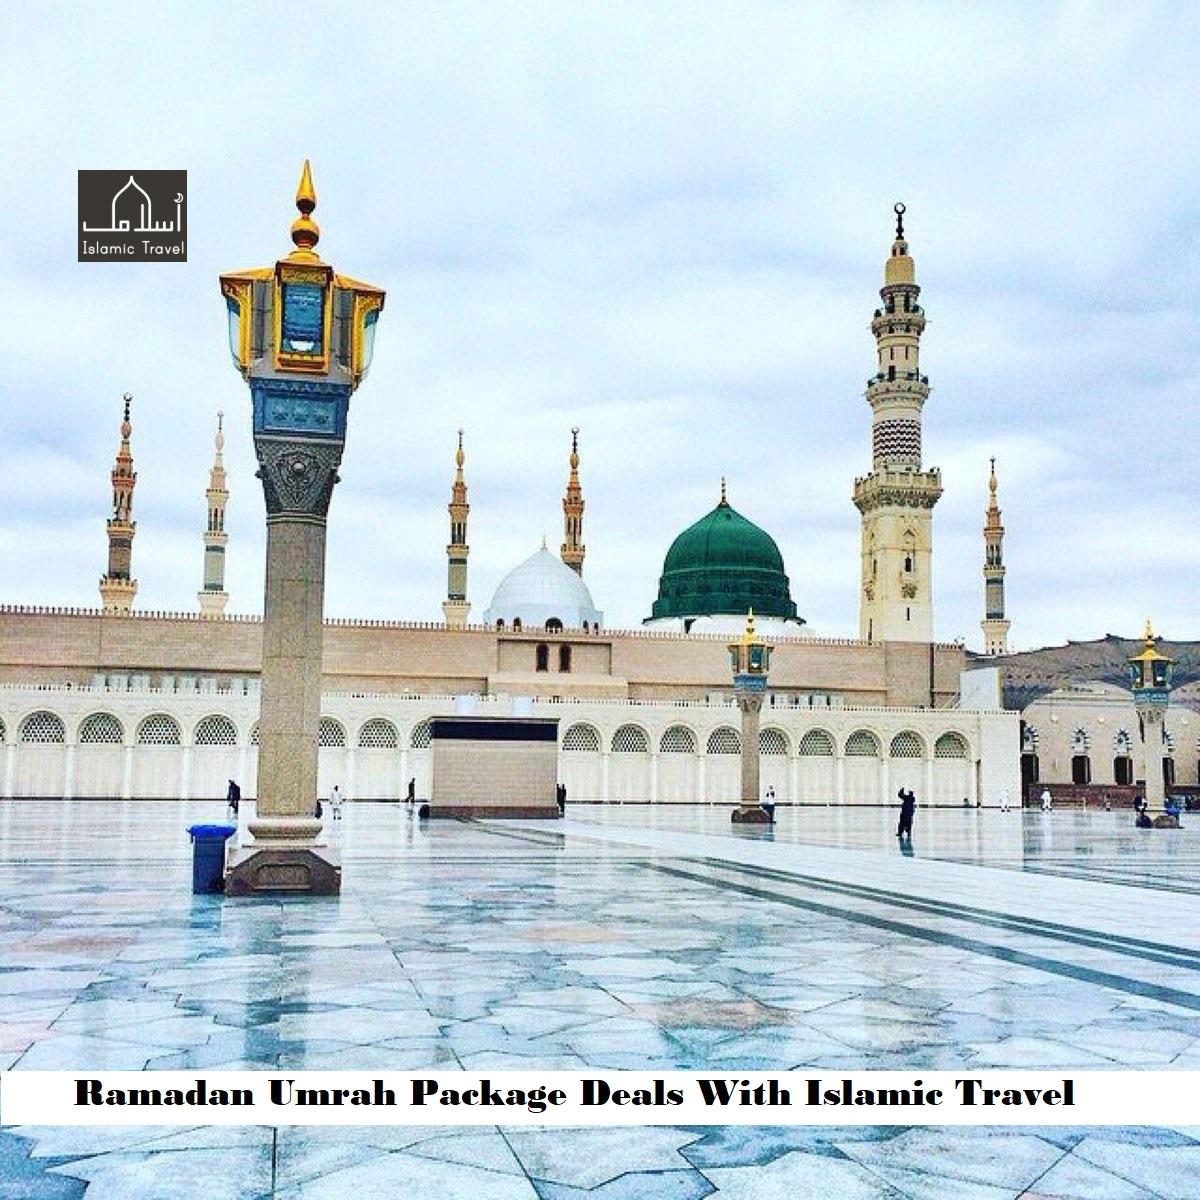 Umrah Banner: Hajj Services